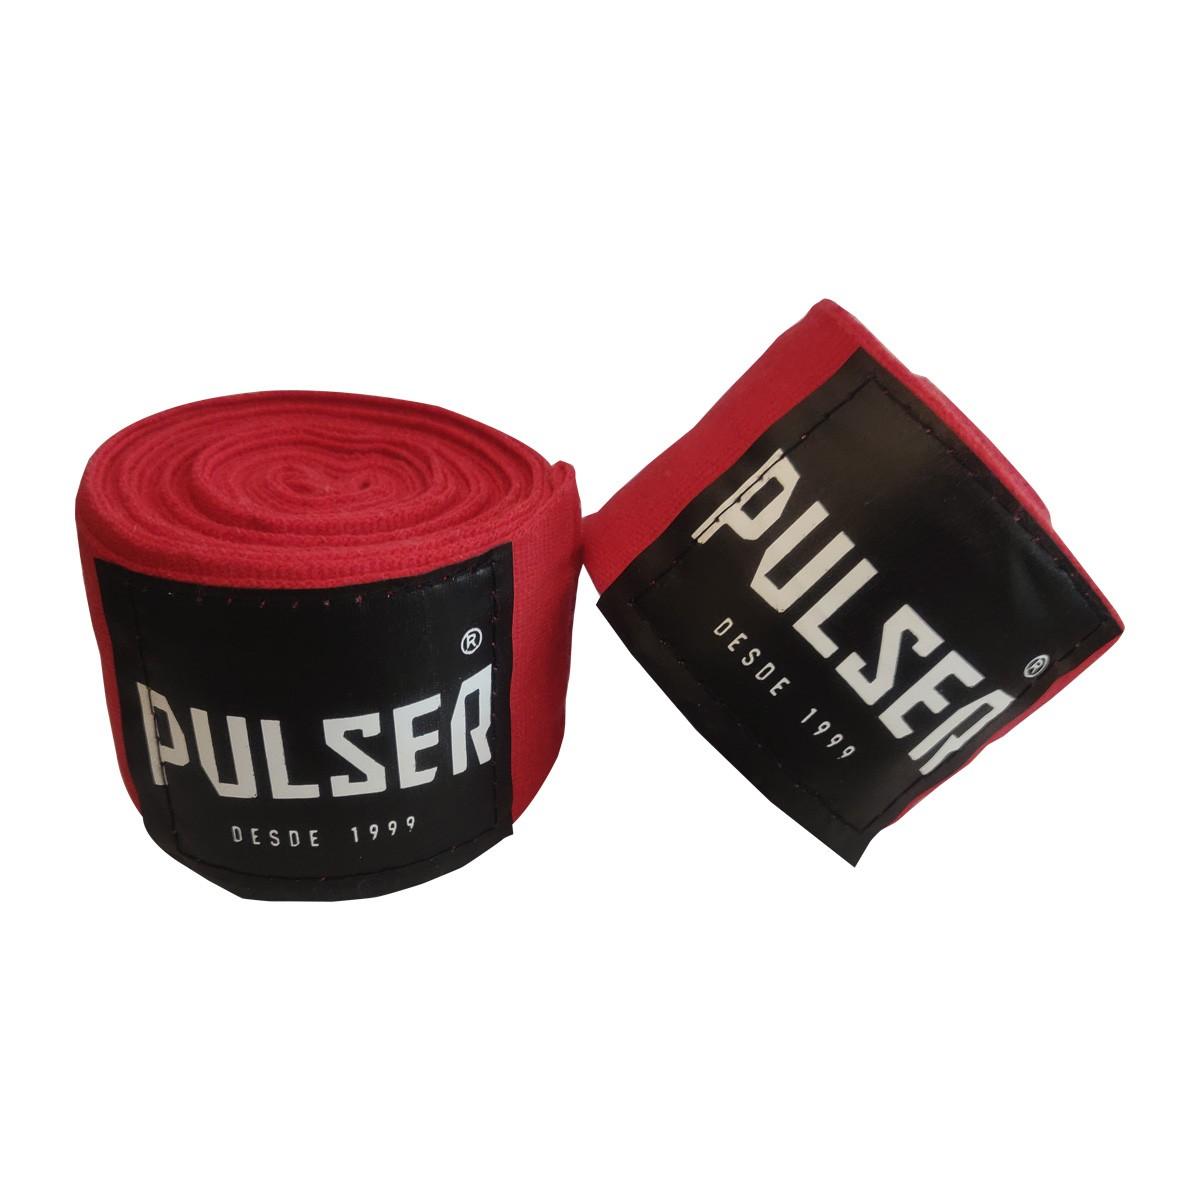 Par De Bandagem Atadura Elástica 4 Metros Muay Thai Boxe - Pulser  - PRALUTA SHOP